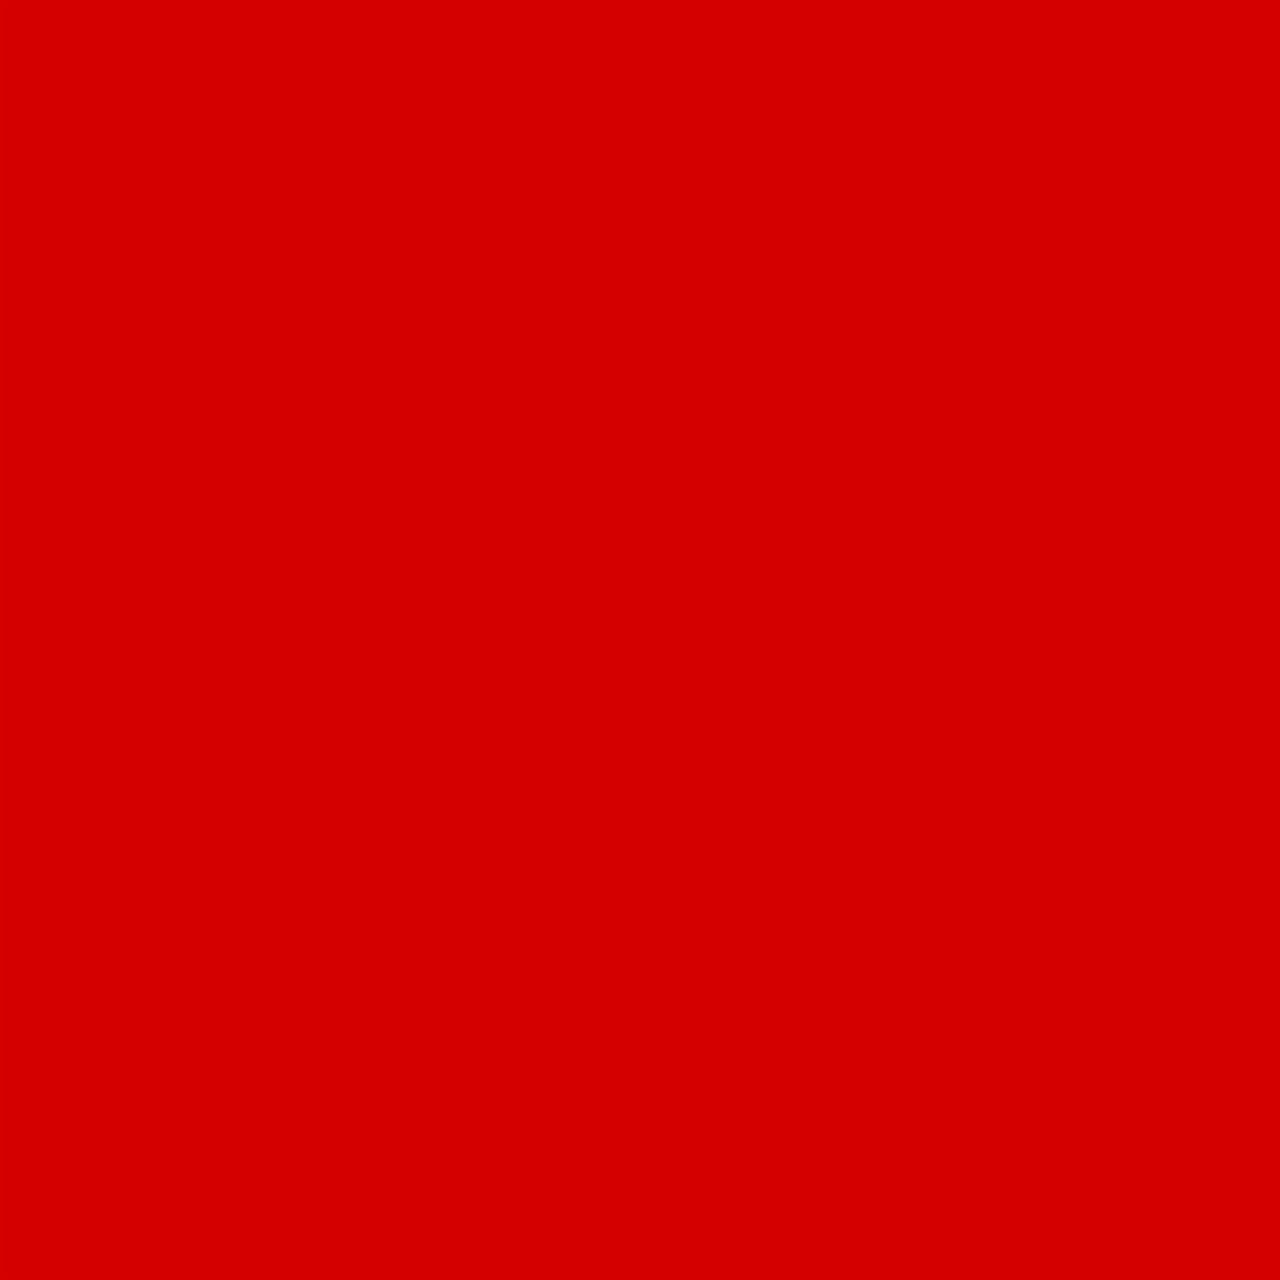 Алюкобонд 318 ГЛЯНЦЕВЫЙ КРАСНЫЙ 8831 ARABOND